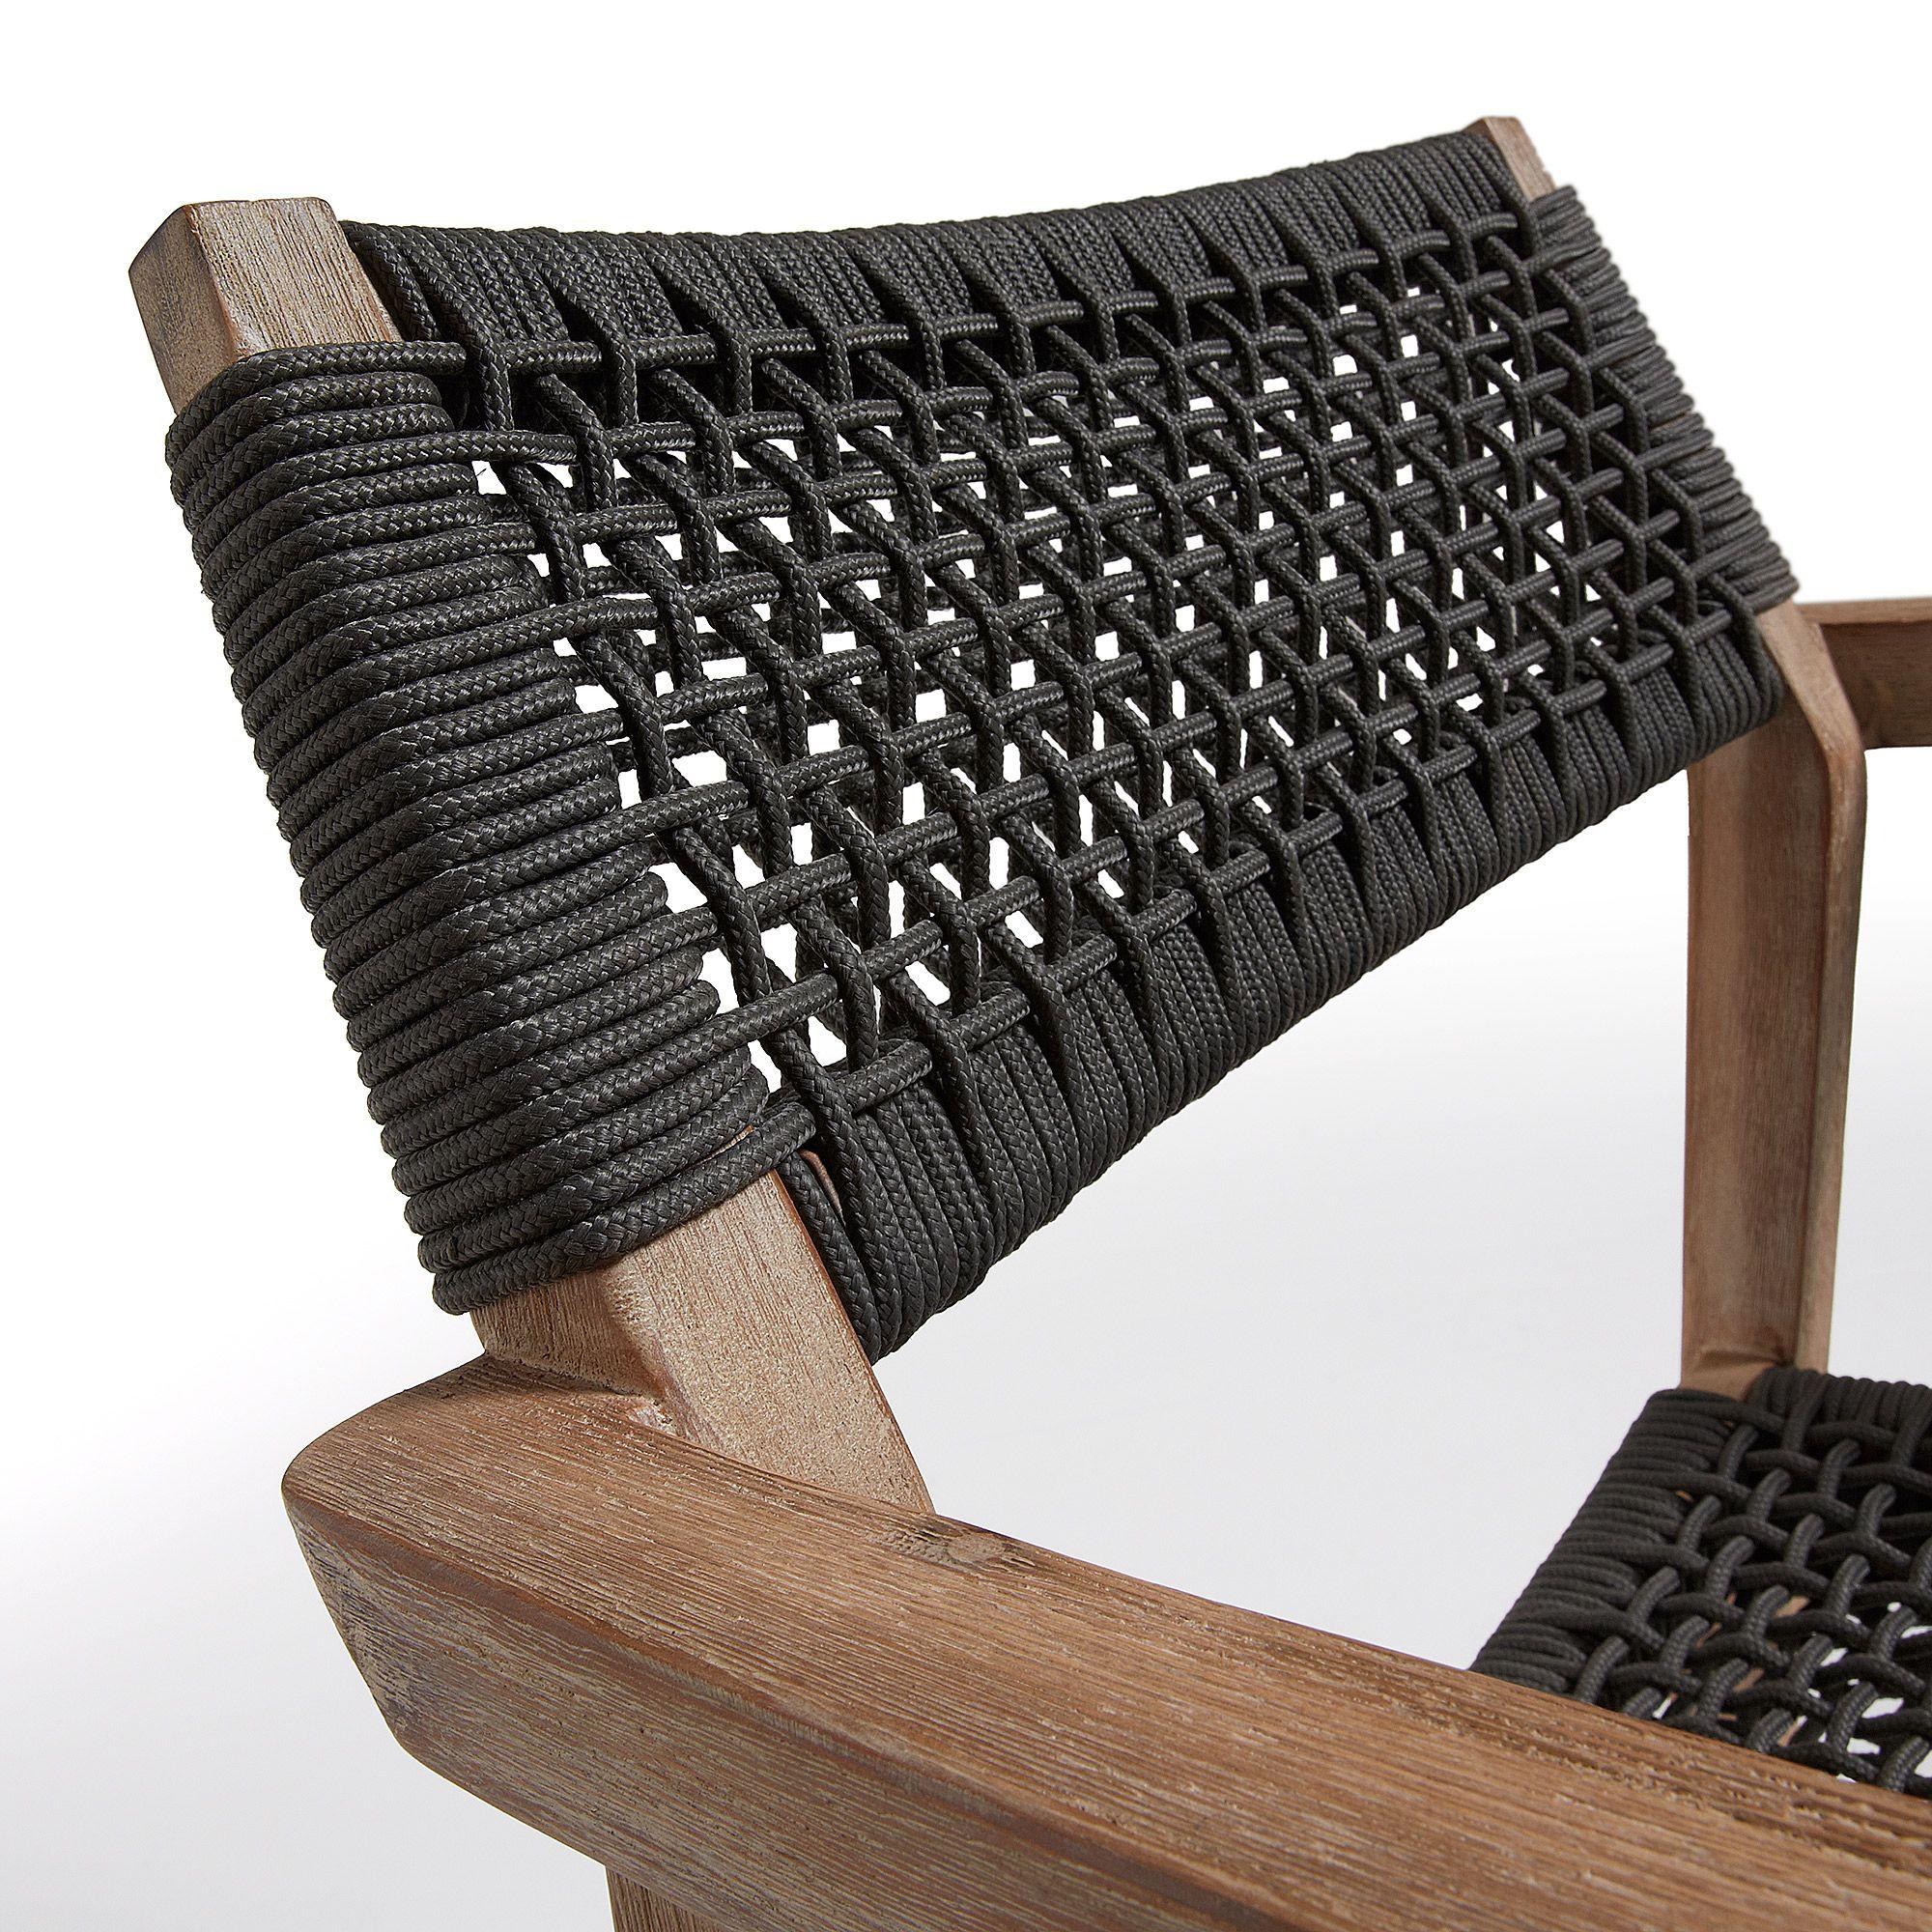 LaForma Corvette Spisebordsstol m/armlæn - Mørk grå